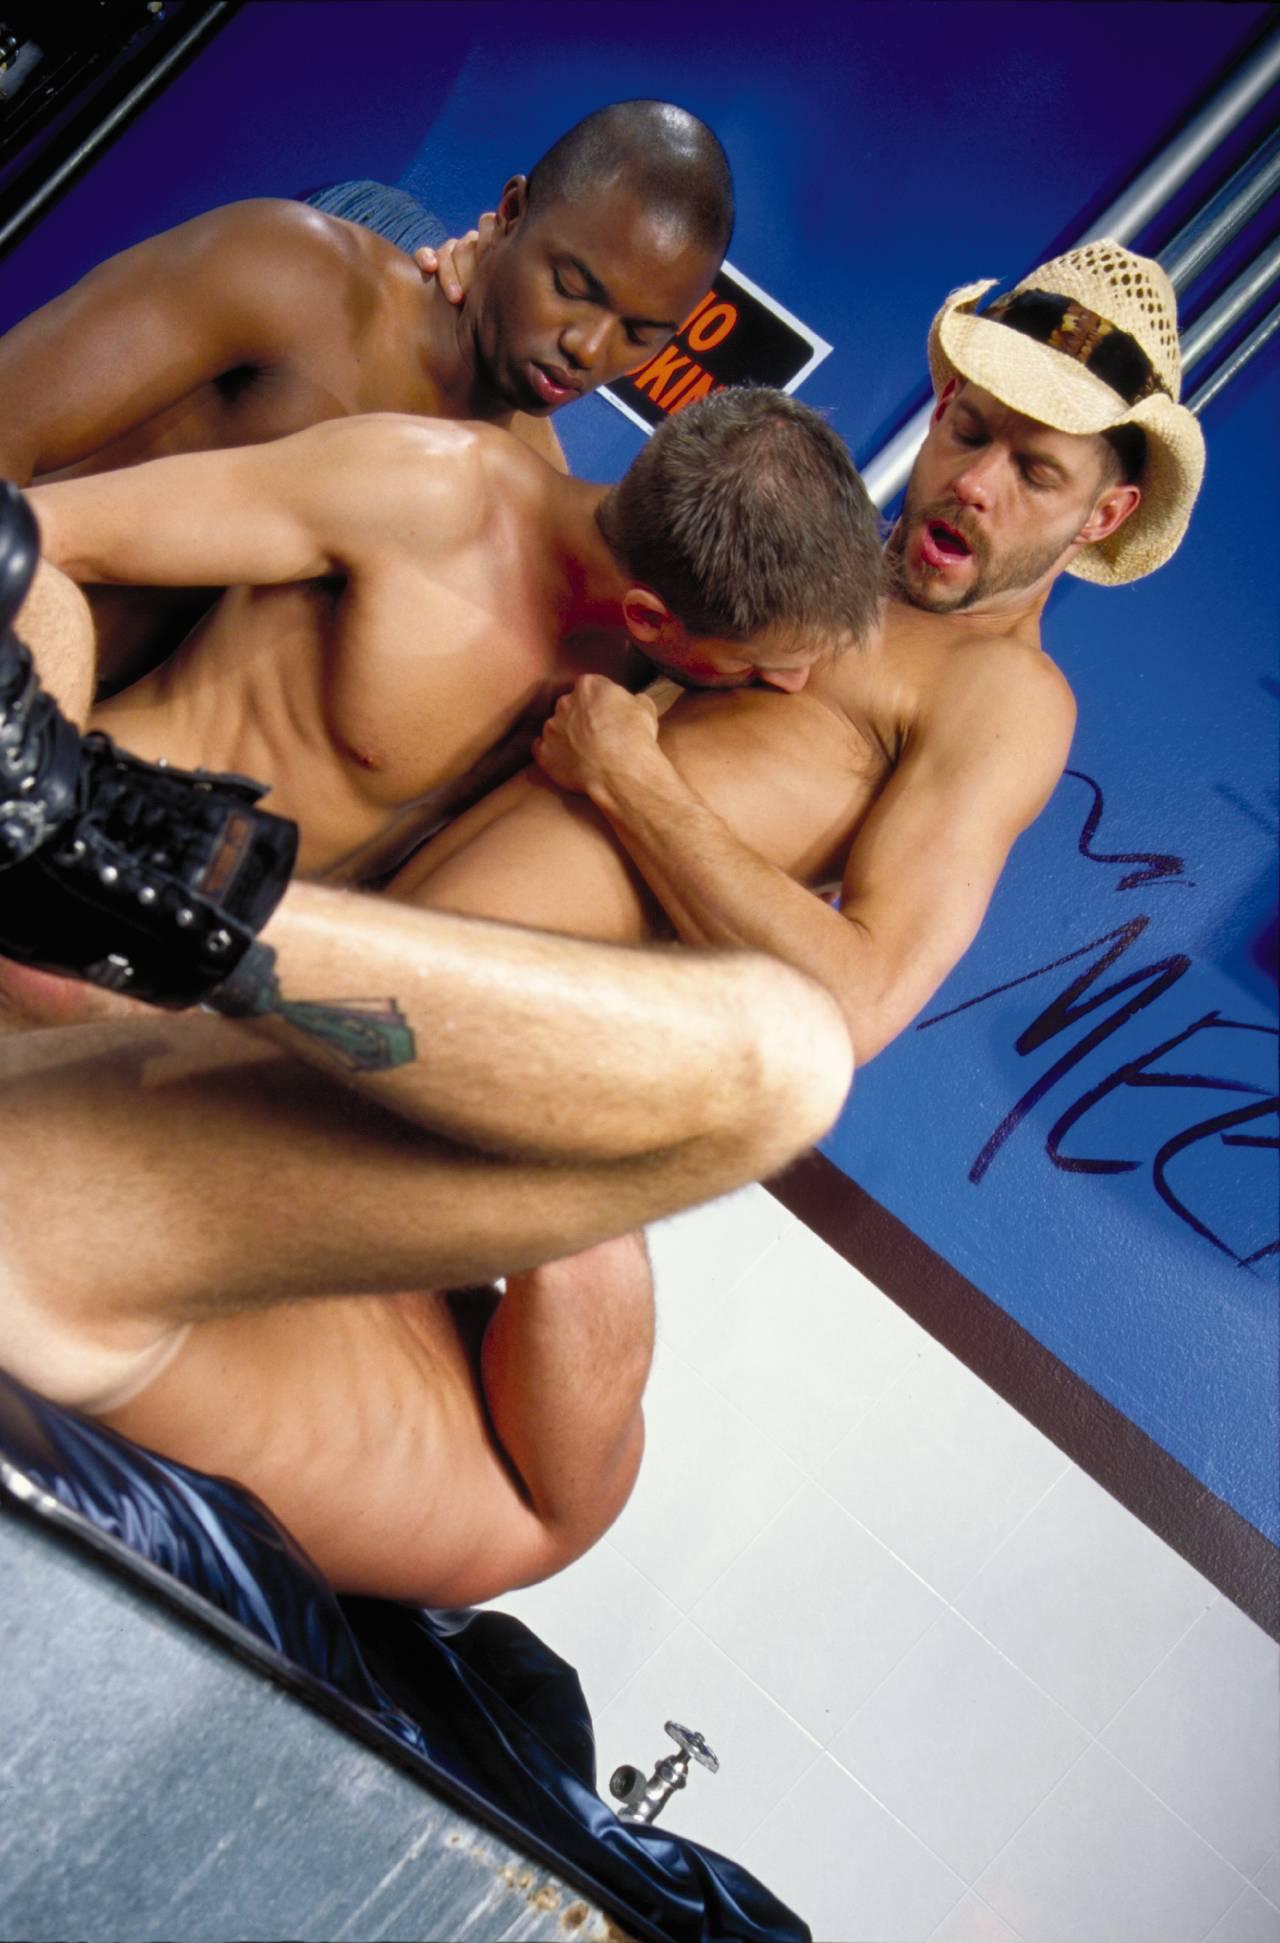 Erik Campbell and Michael Brandon fuck Jason Dean and Tag Adams gay hot daddy dude men porn public toilet Pokin' in the Boys Room